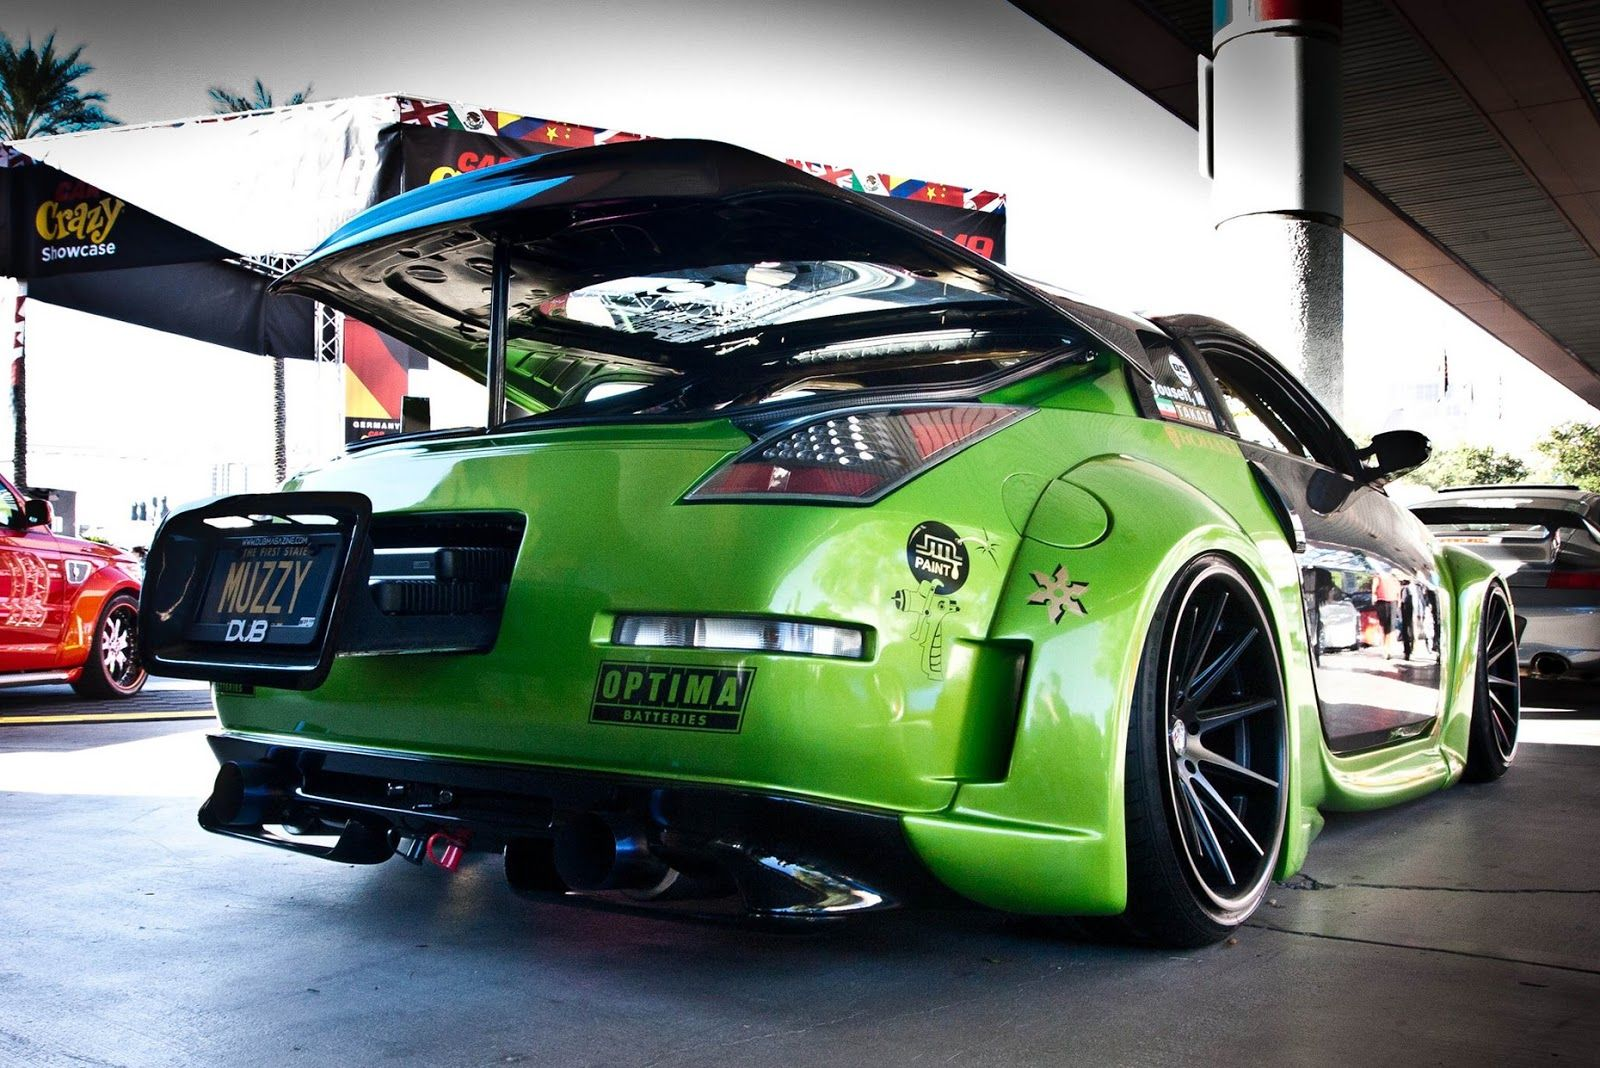 Nissan - 350Z Veilside Tuning | 350 z | Nissan 350z, Nissan, Nissan 370z